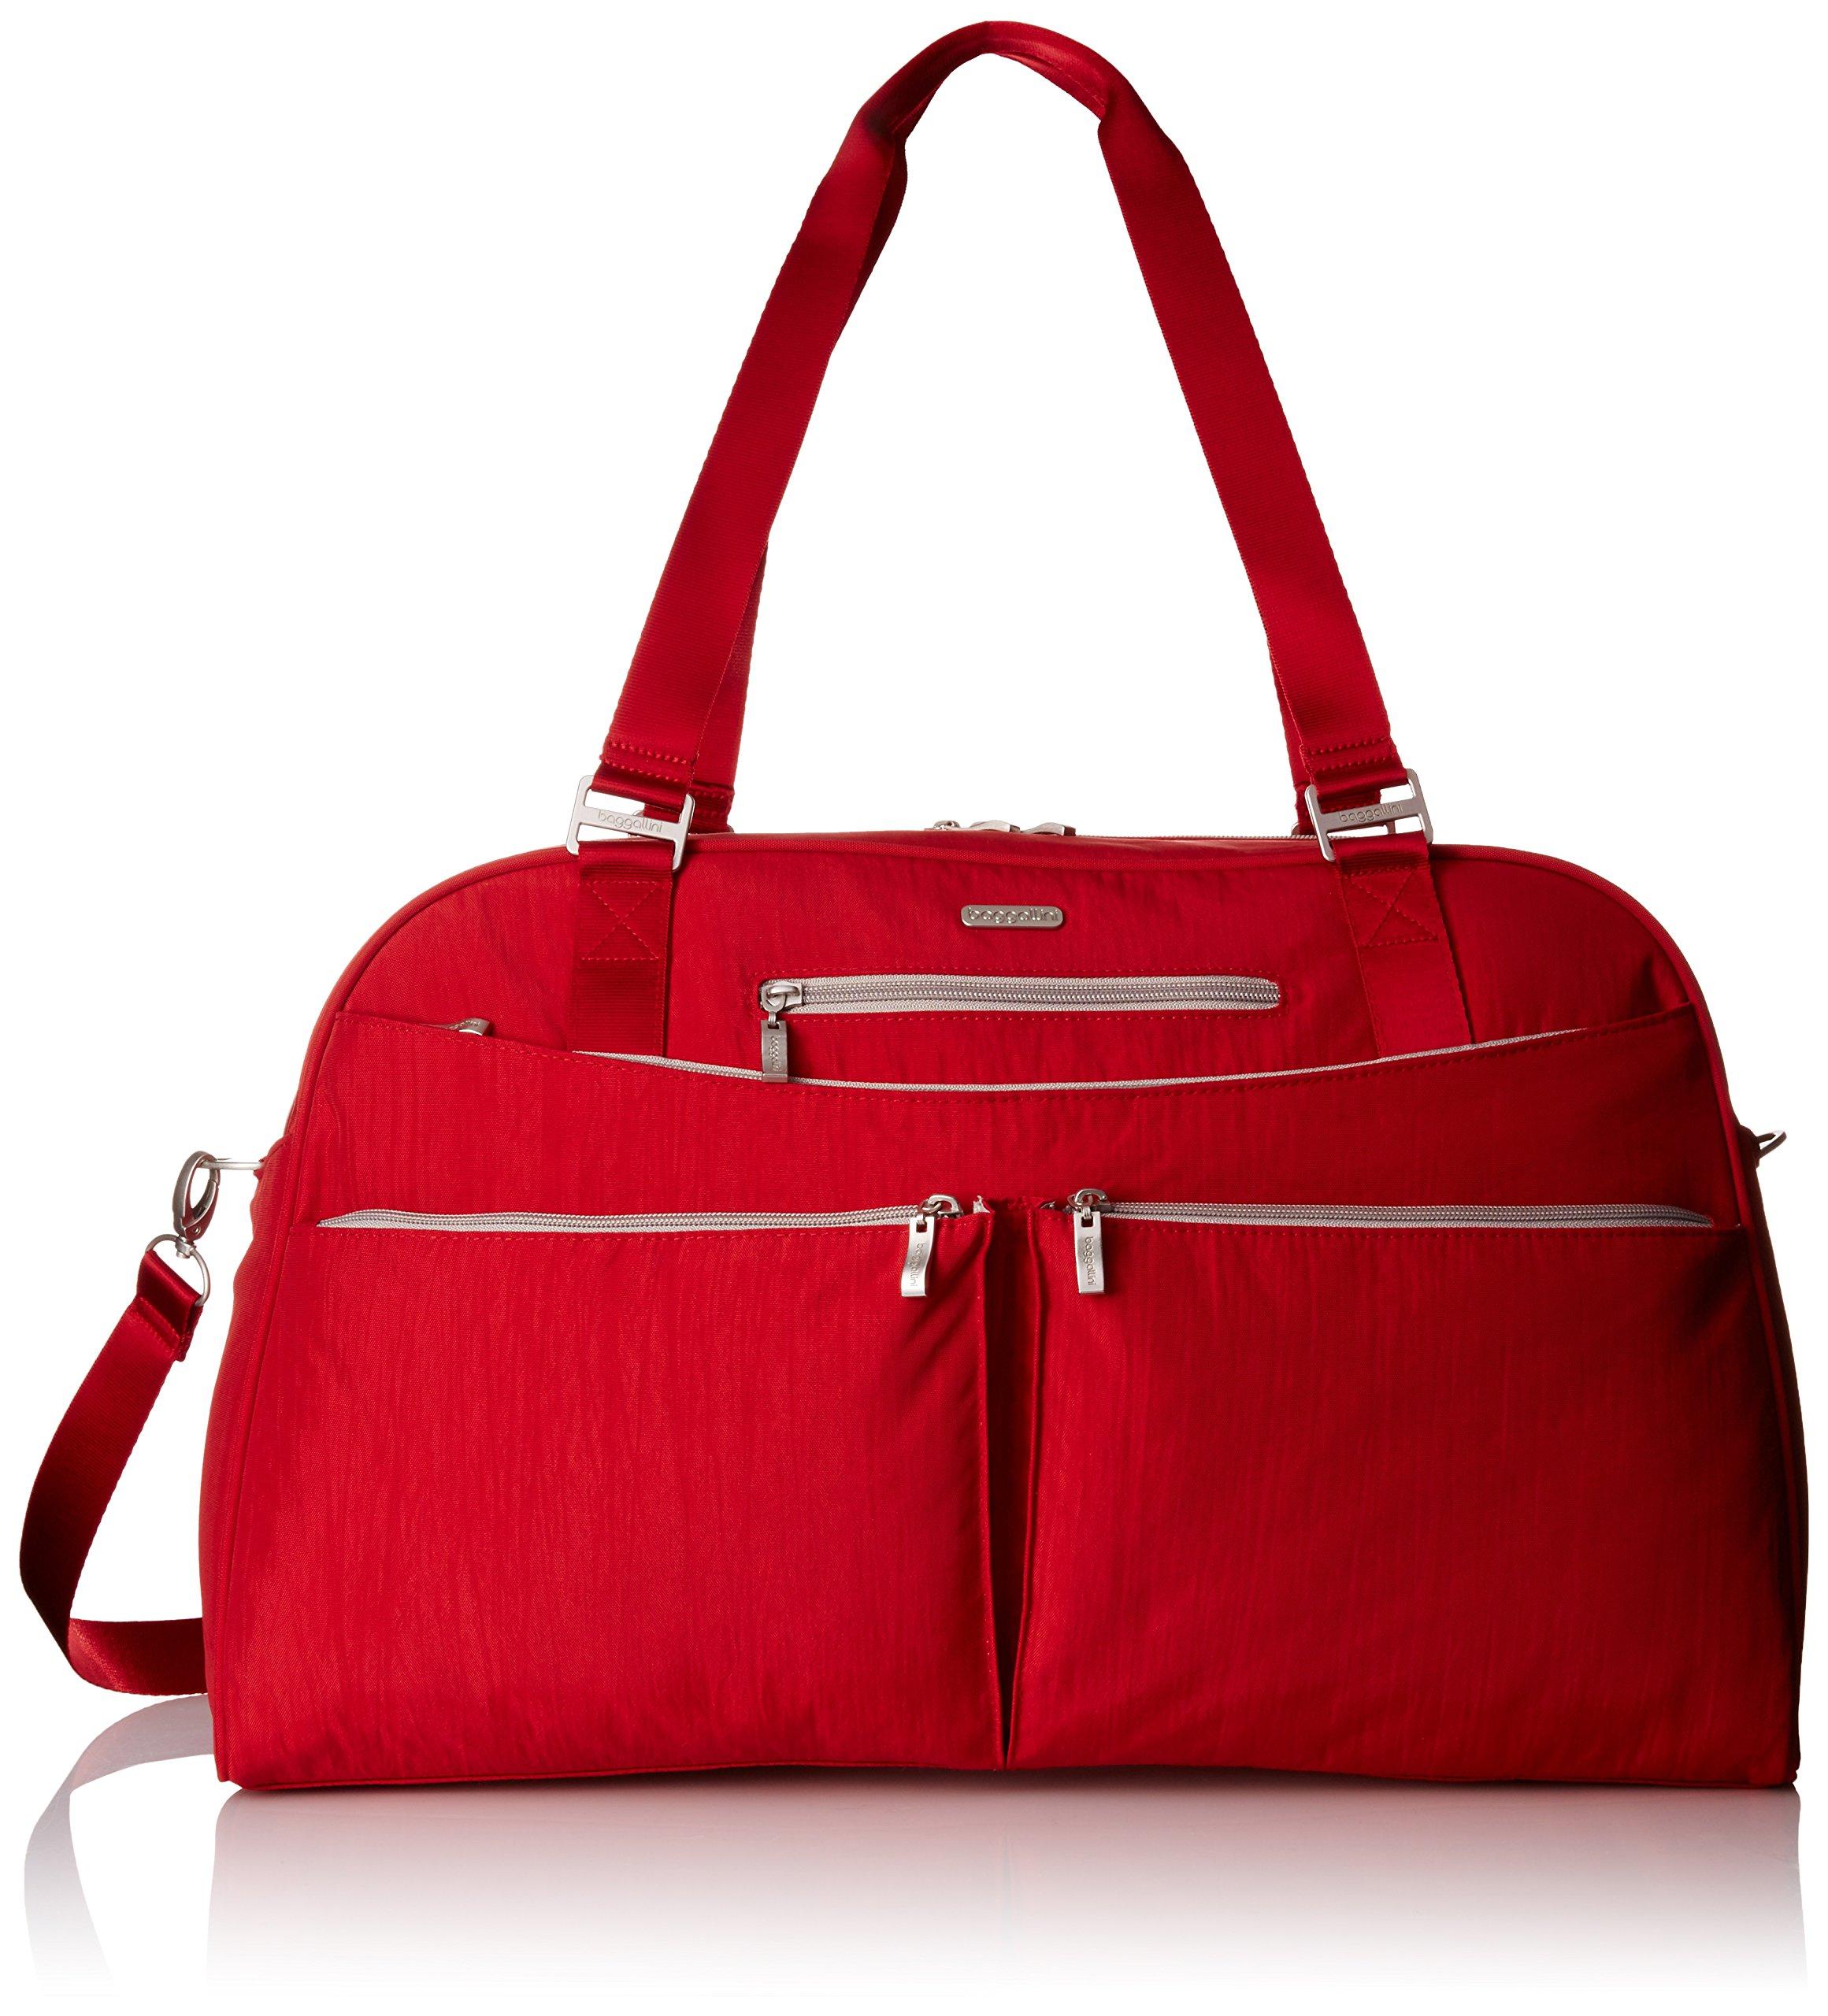 Baggallini Weekender Travel Tote Bag, Apple, One Size